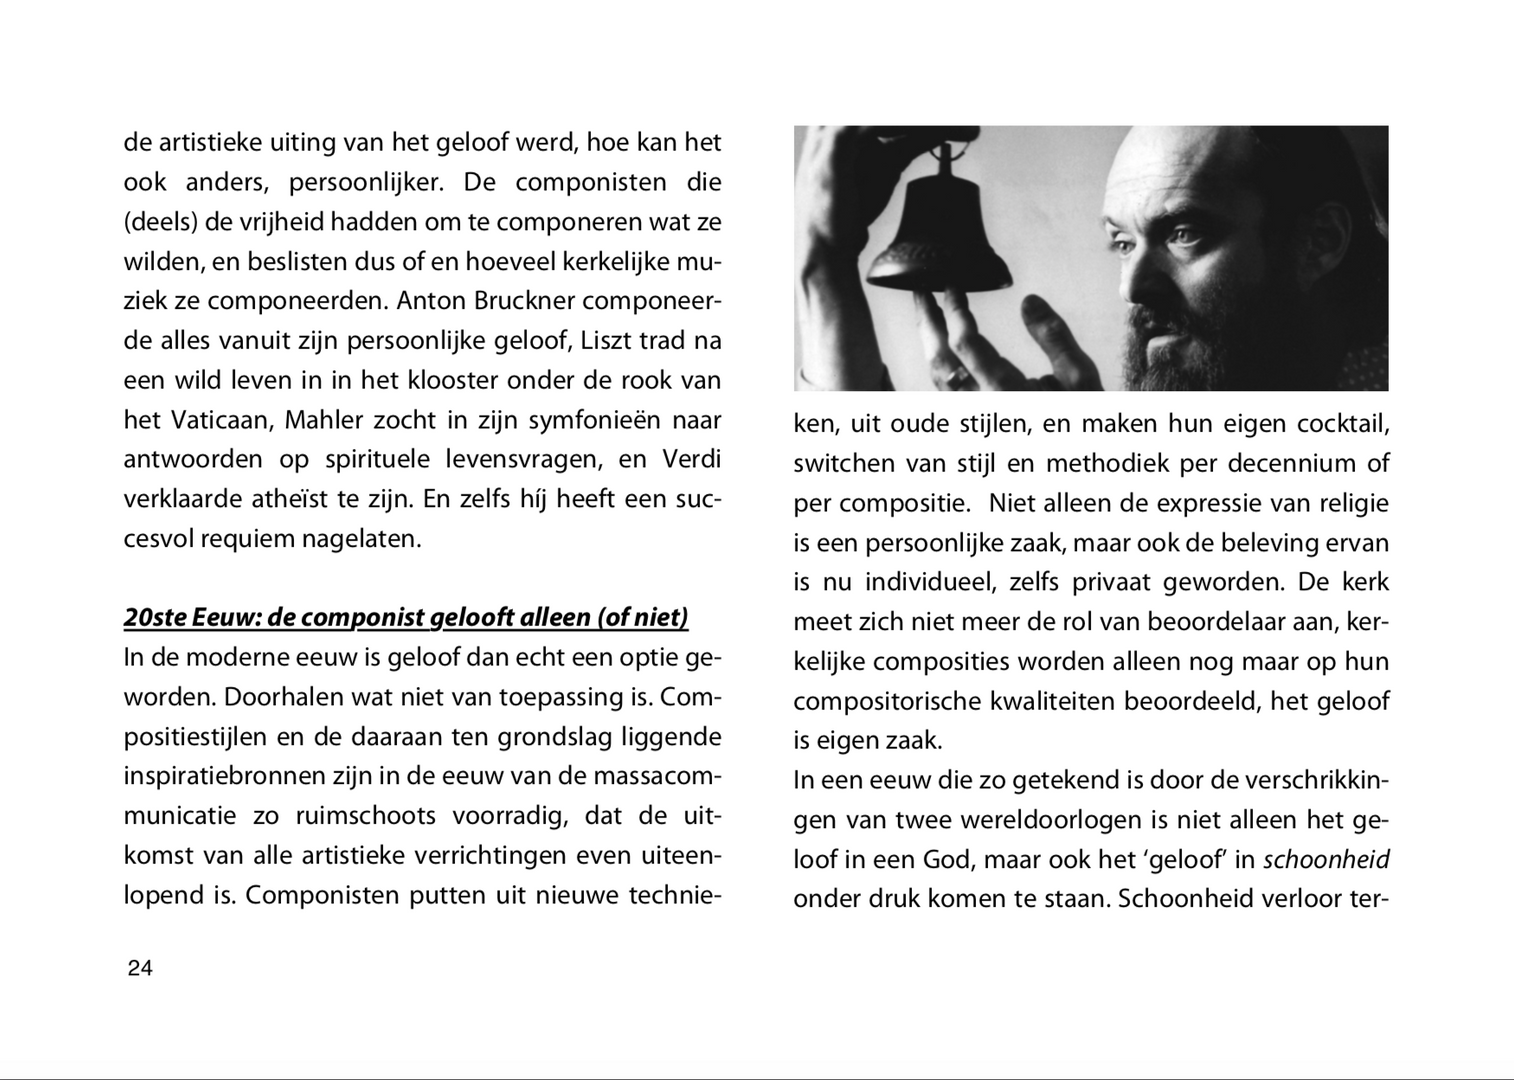 Cursusboek blz 24.png